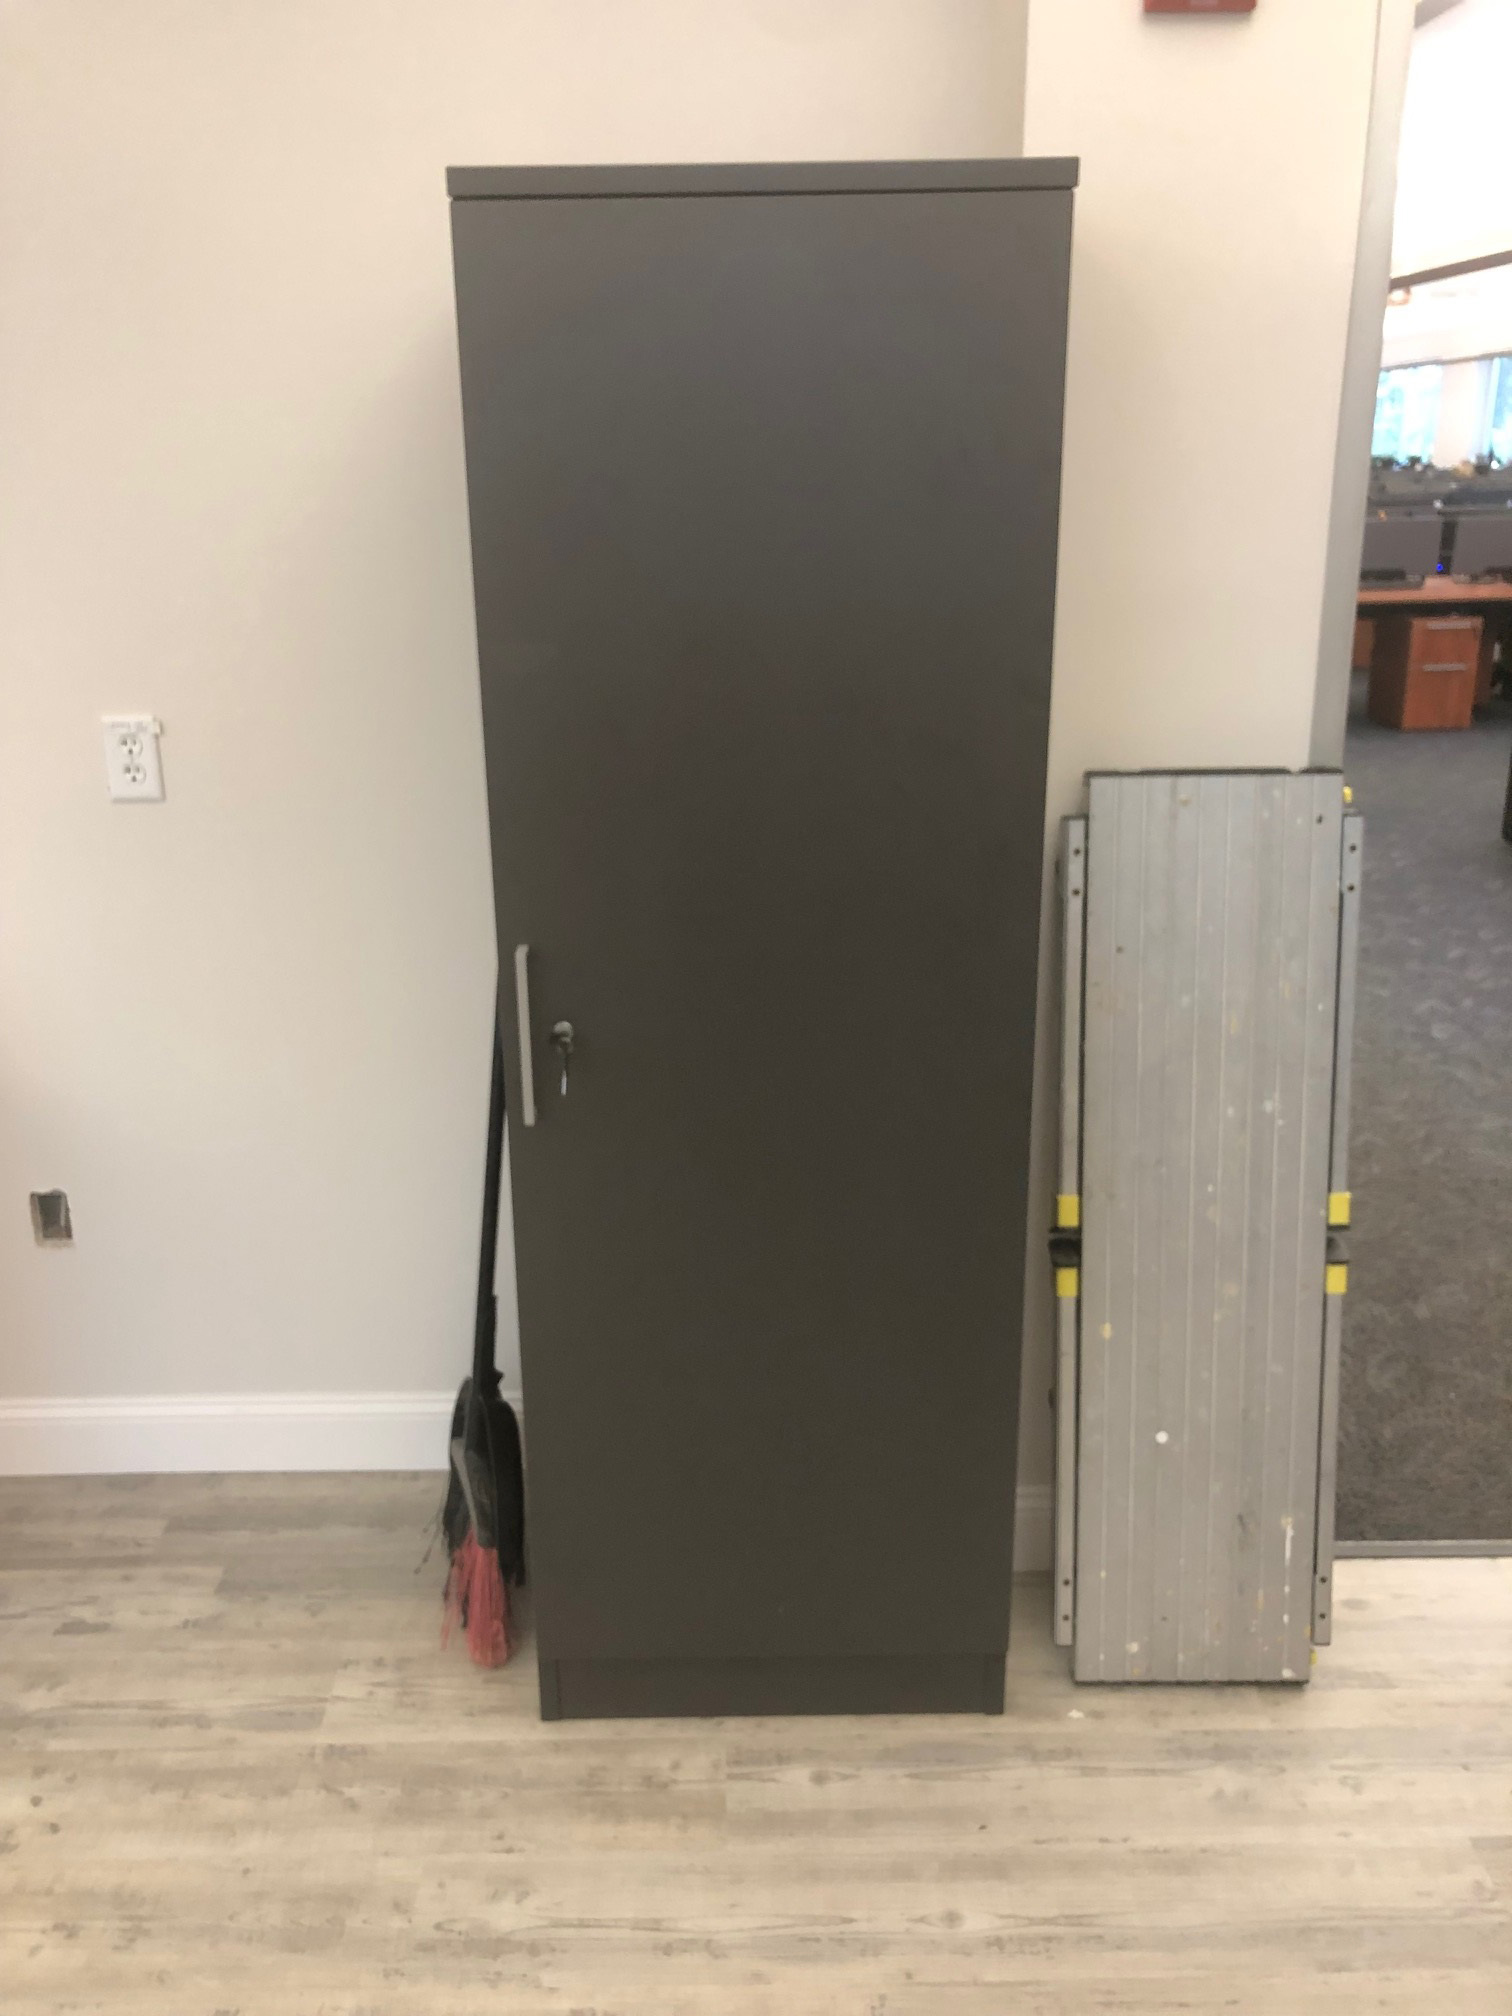 furniture-office-supplies-in-key-biscayne-florida-2-1.jpg